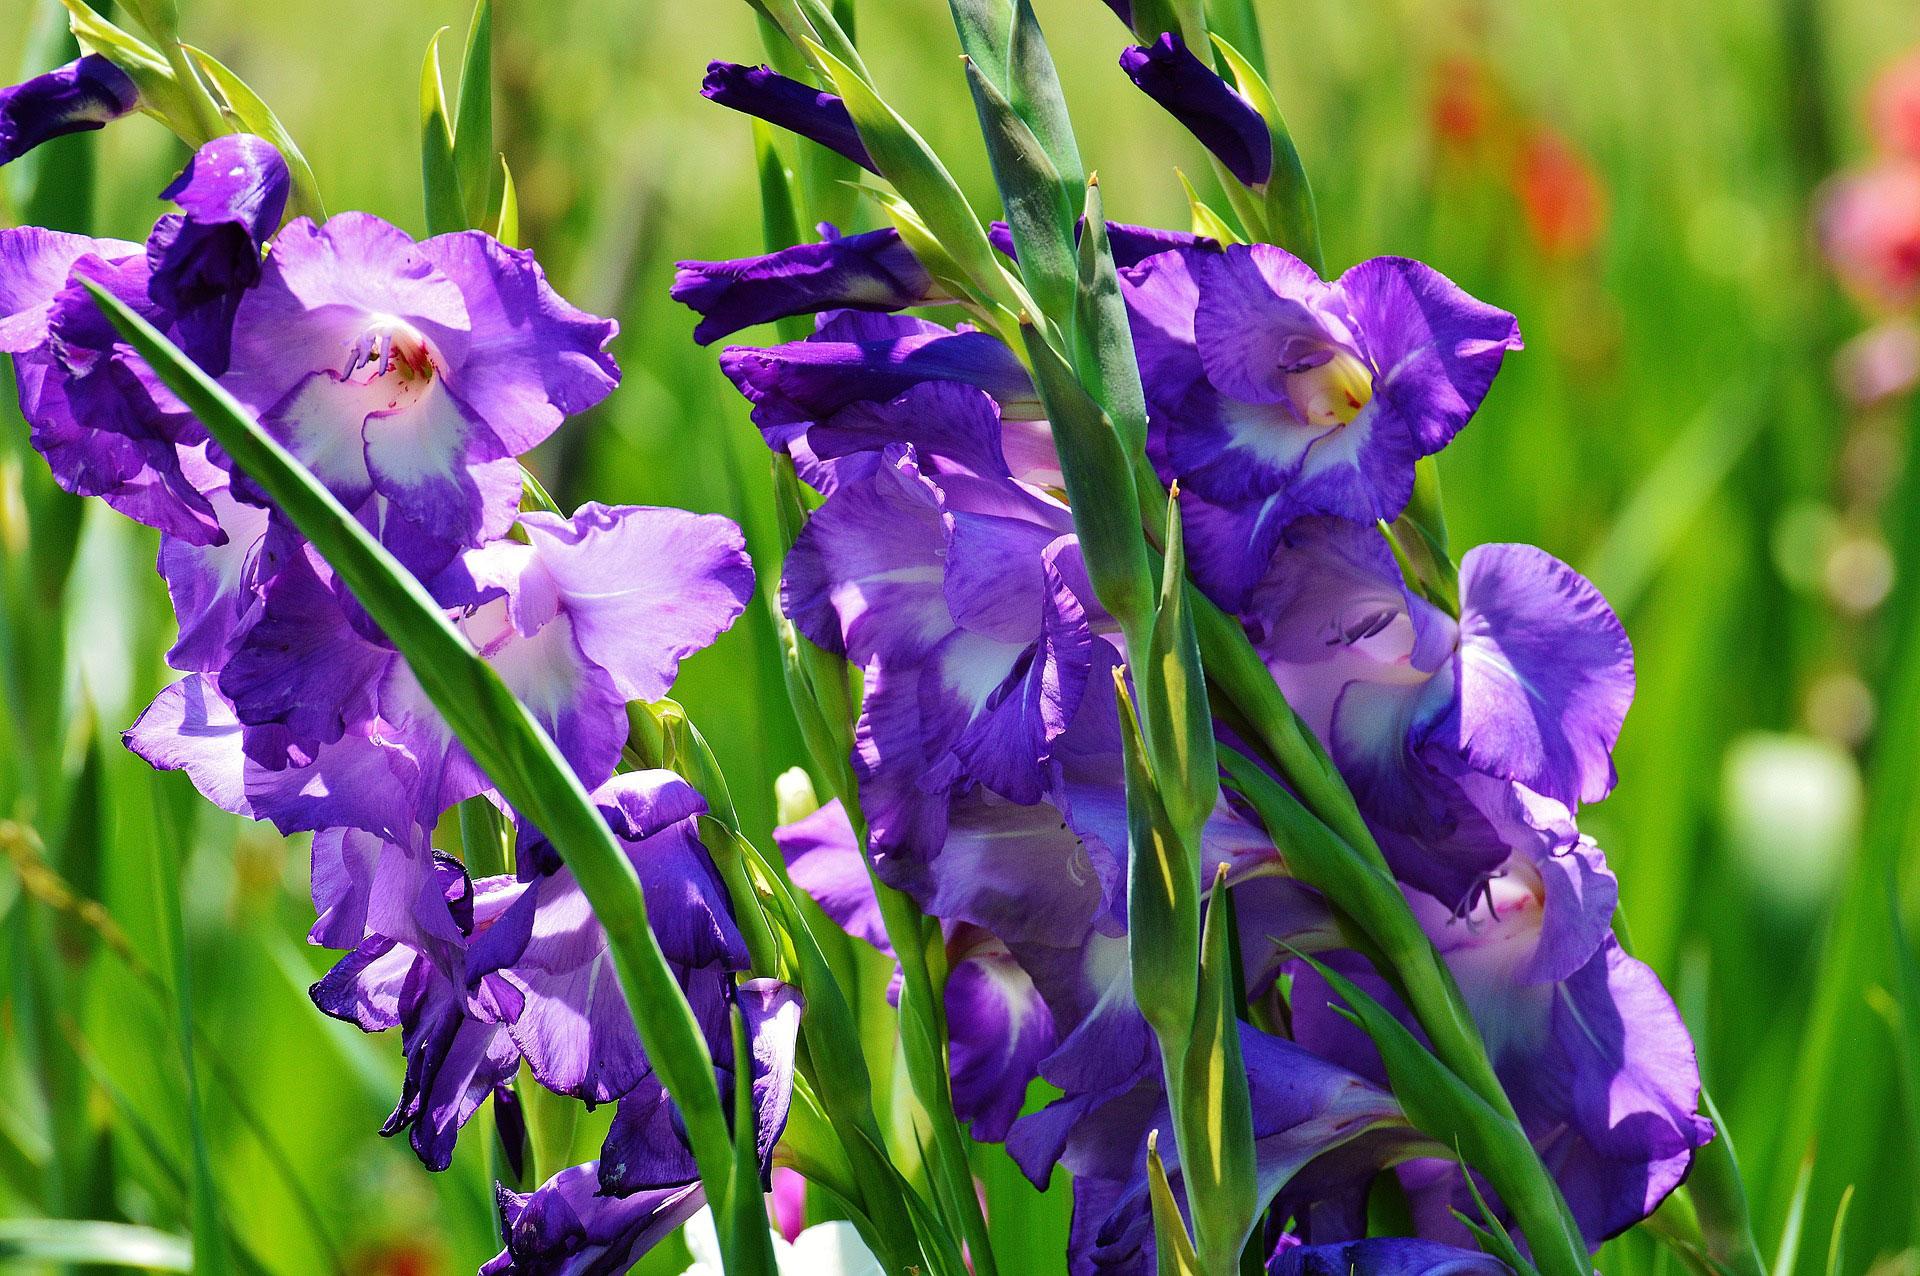 Flower facts archives tudor rose florist ballincollig cork blog flower facts izmirmasajfo